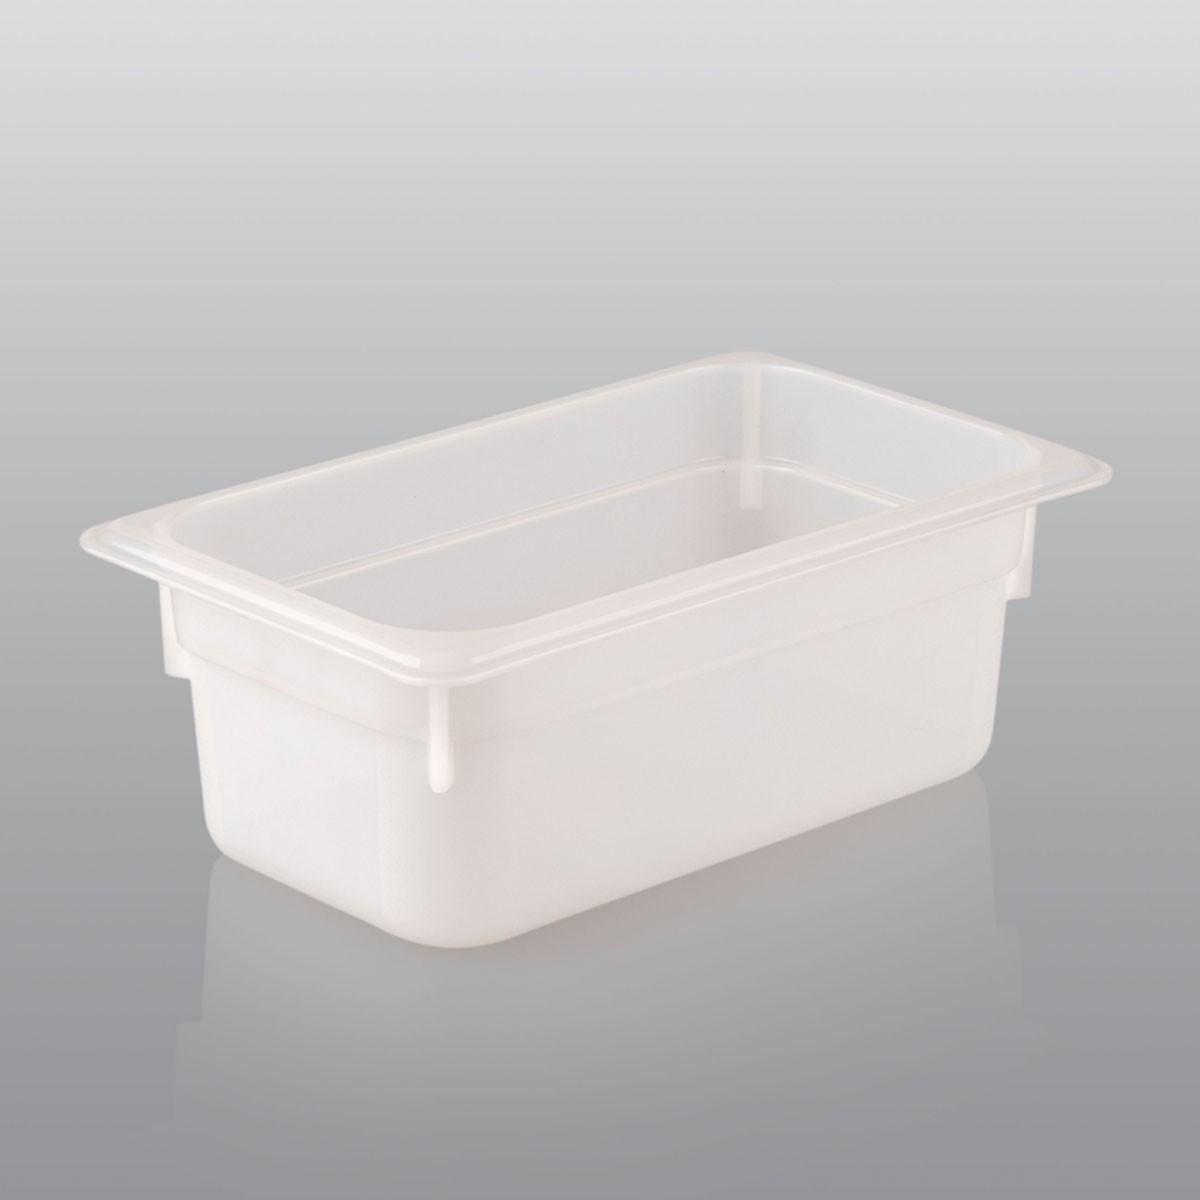 GN Behälter GN 1/4 aus Polypropylen (Tiefe: 150mm) Saro 4,0 L